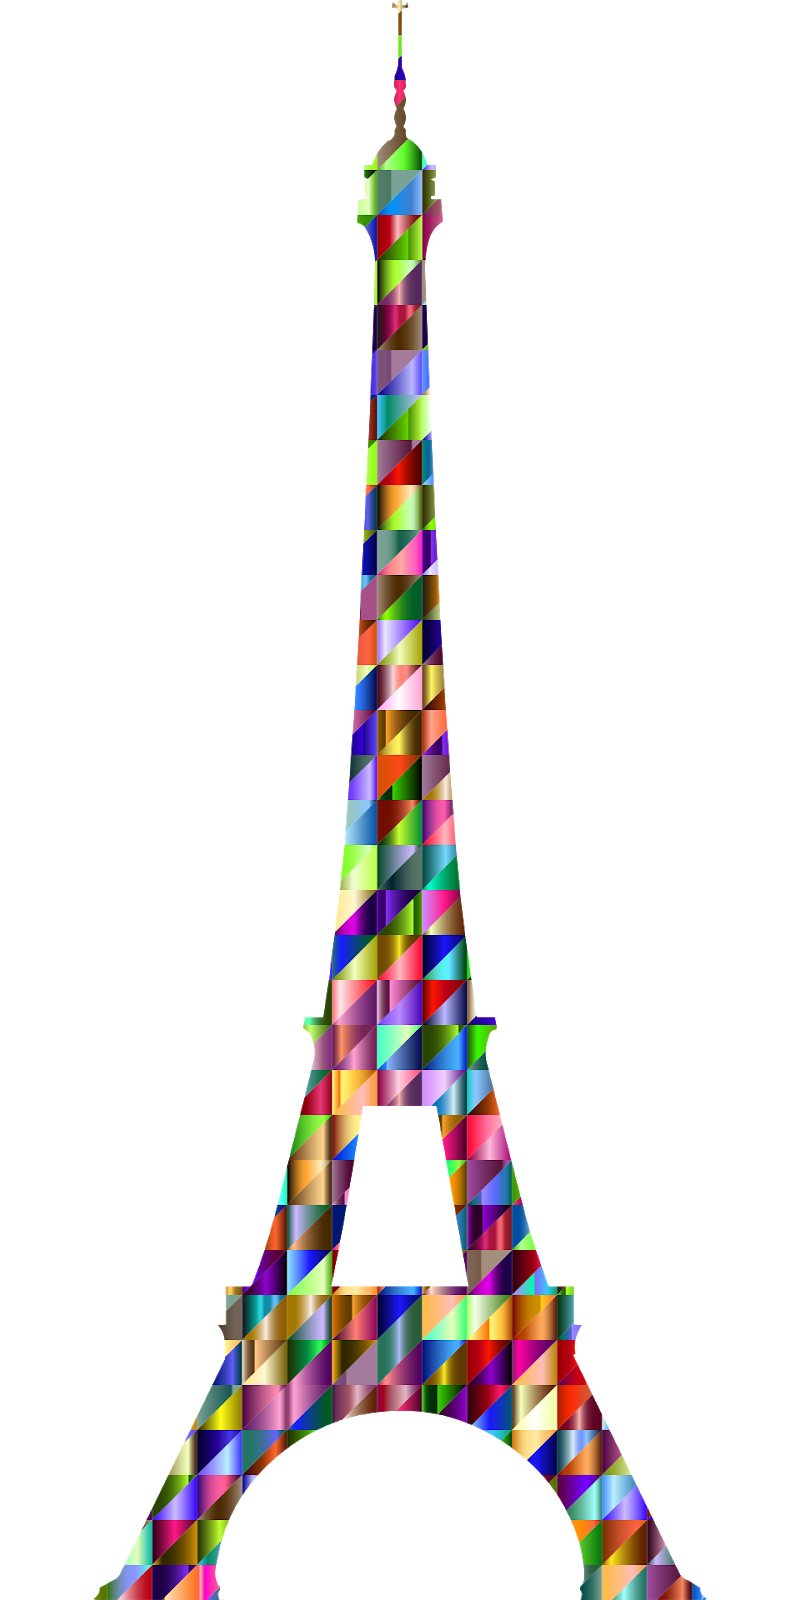 Paris masculino ou feminino